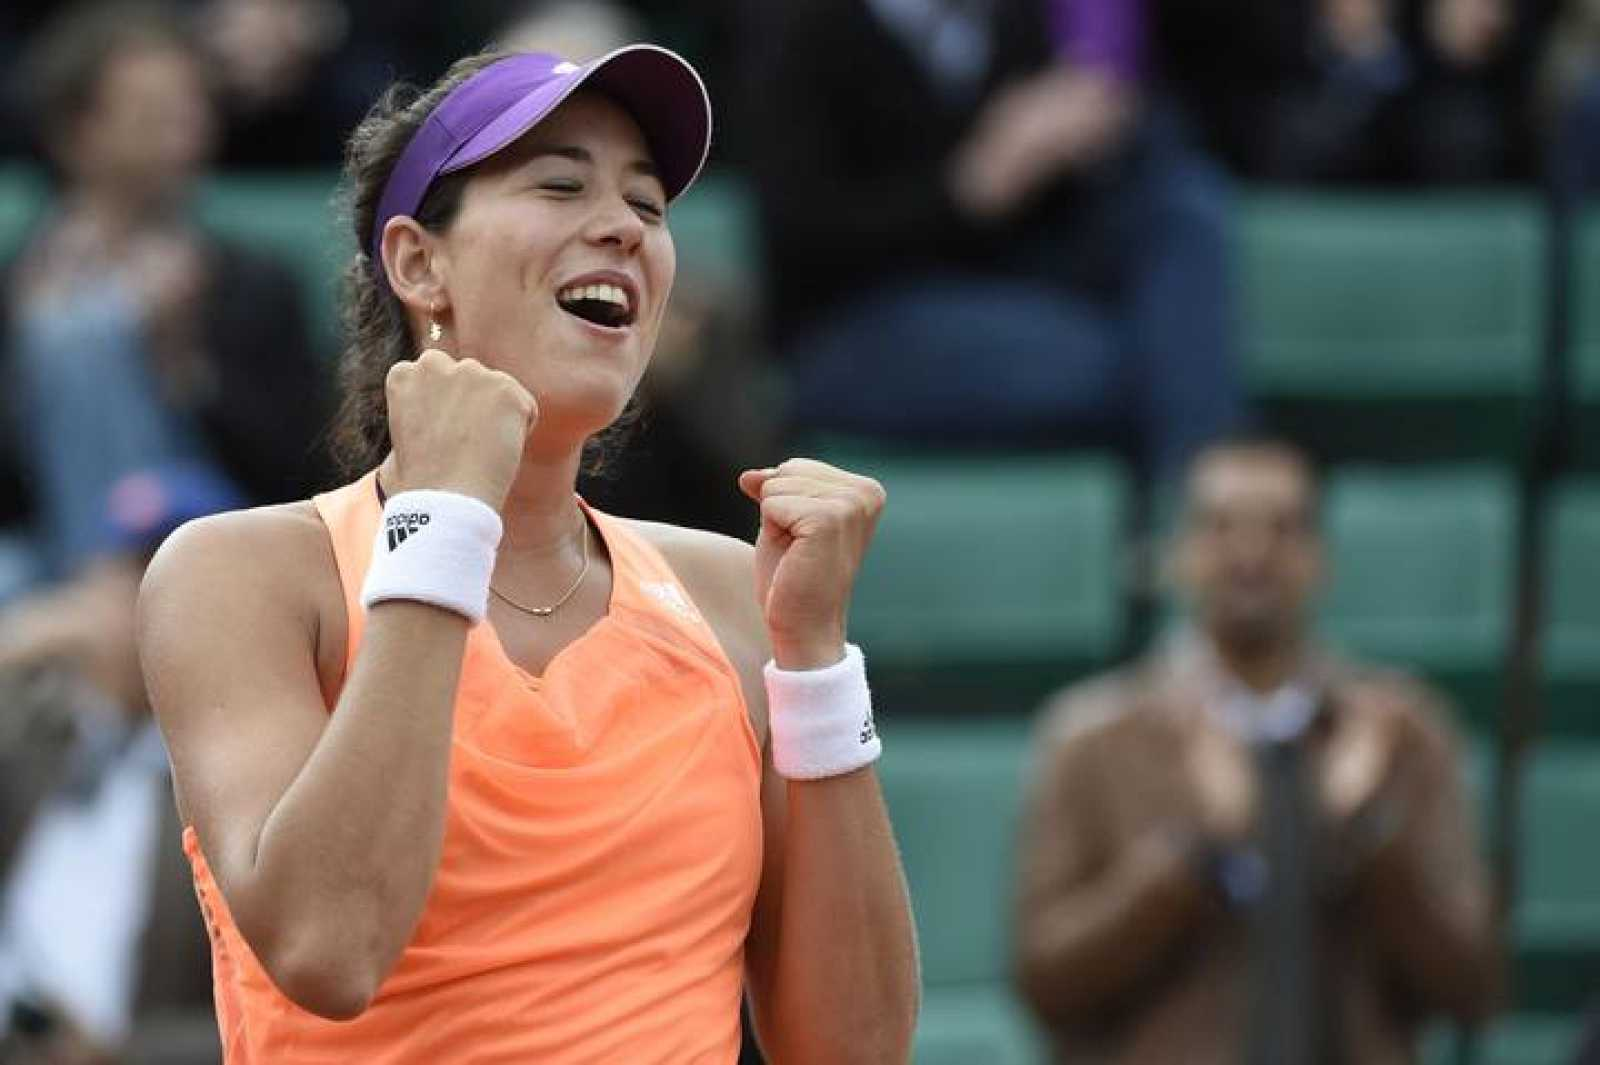 Garbiñe Muguruza celebra su triunfo sobre Serena Williams en Roland Garros